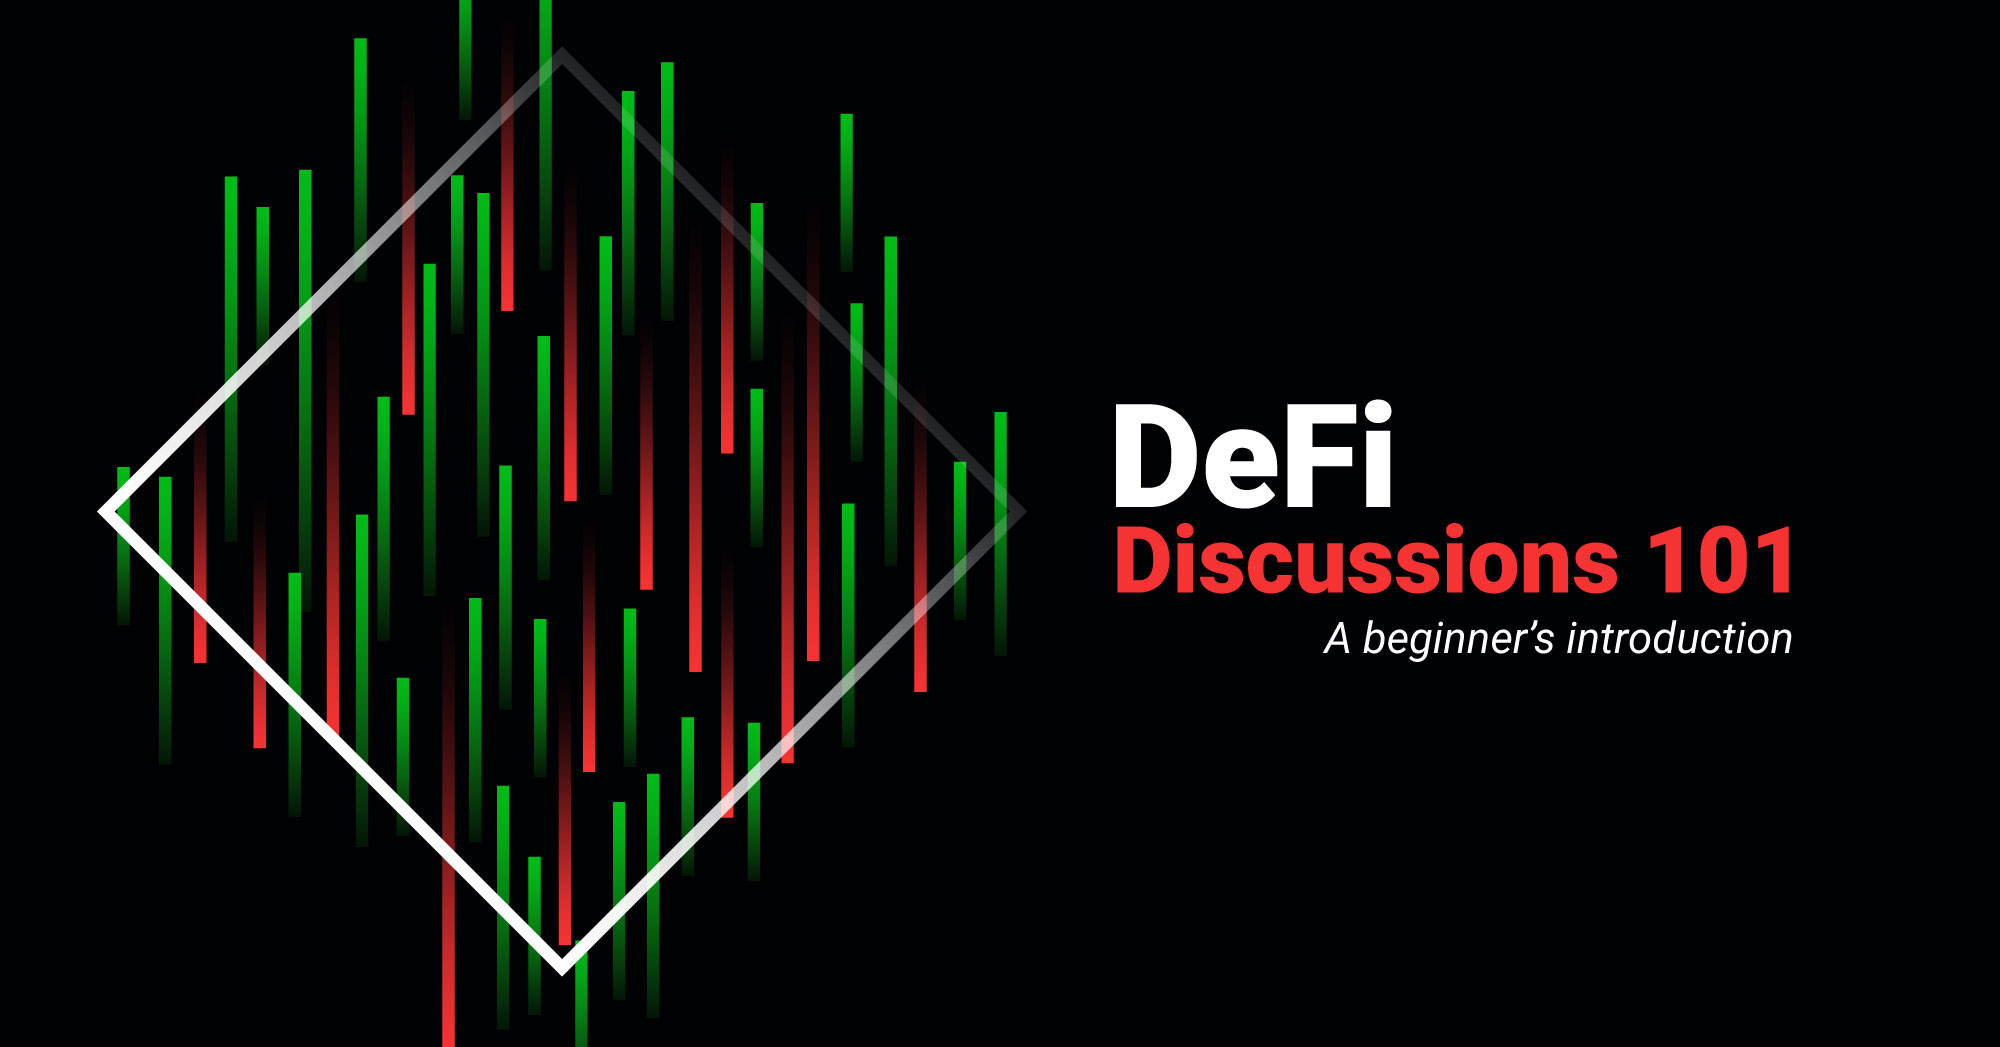 Defi 101: A Beginner's Introduction